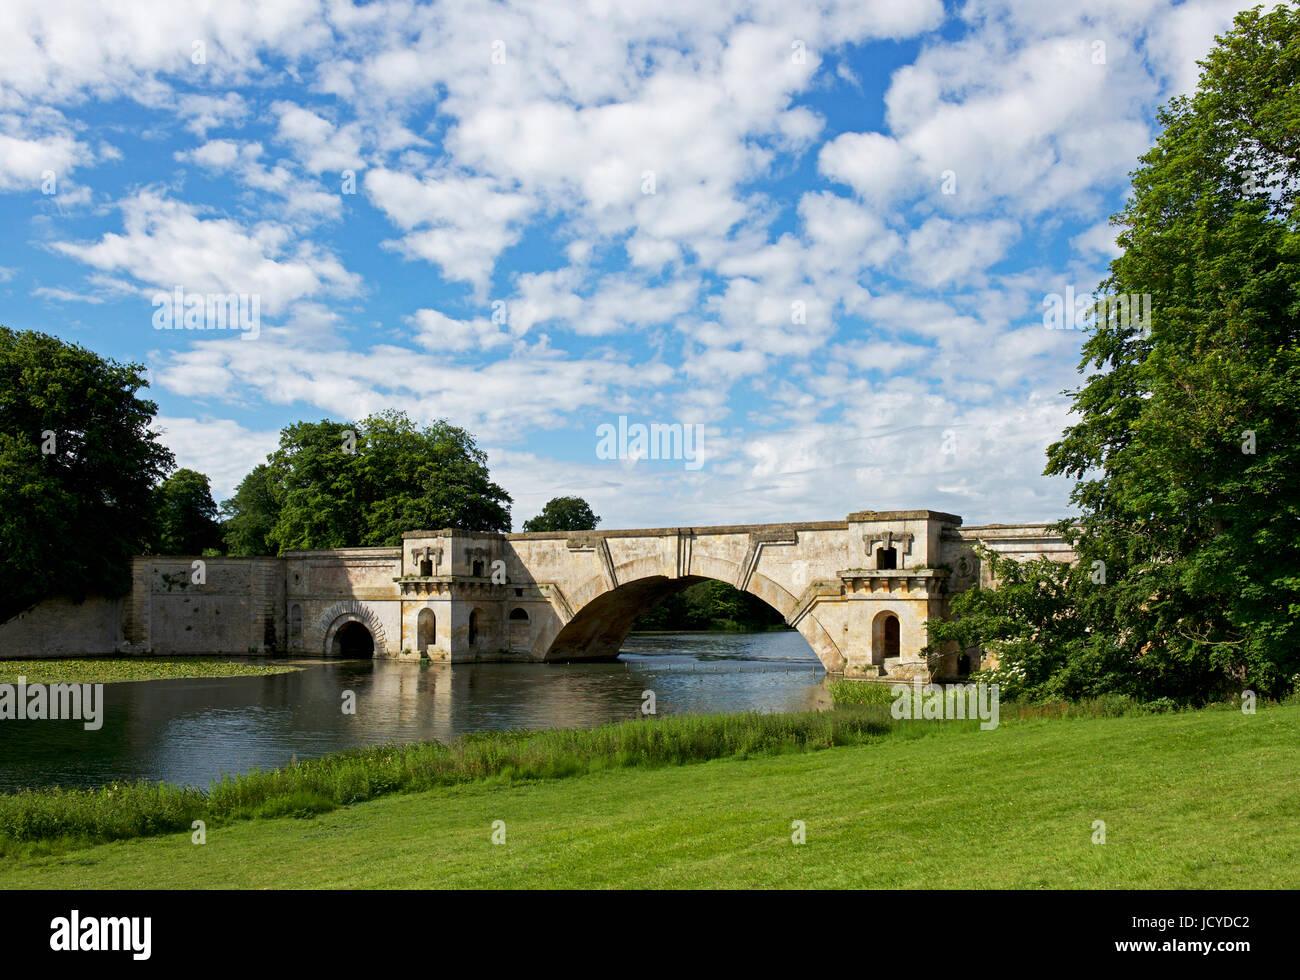 Parques en el Palacio de Blenheim, Woodstock, Oxfordshire, Inglaterra Imagen De Stock